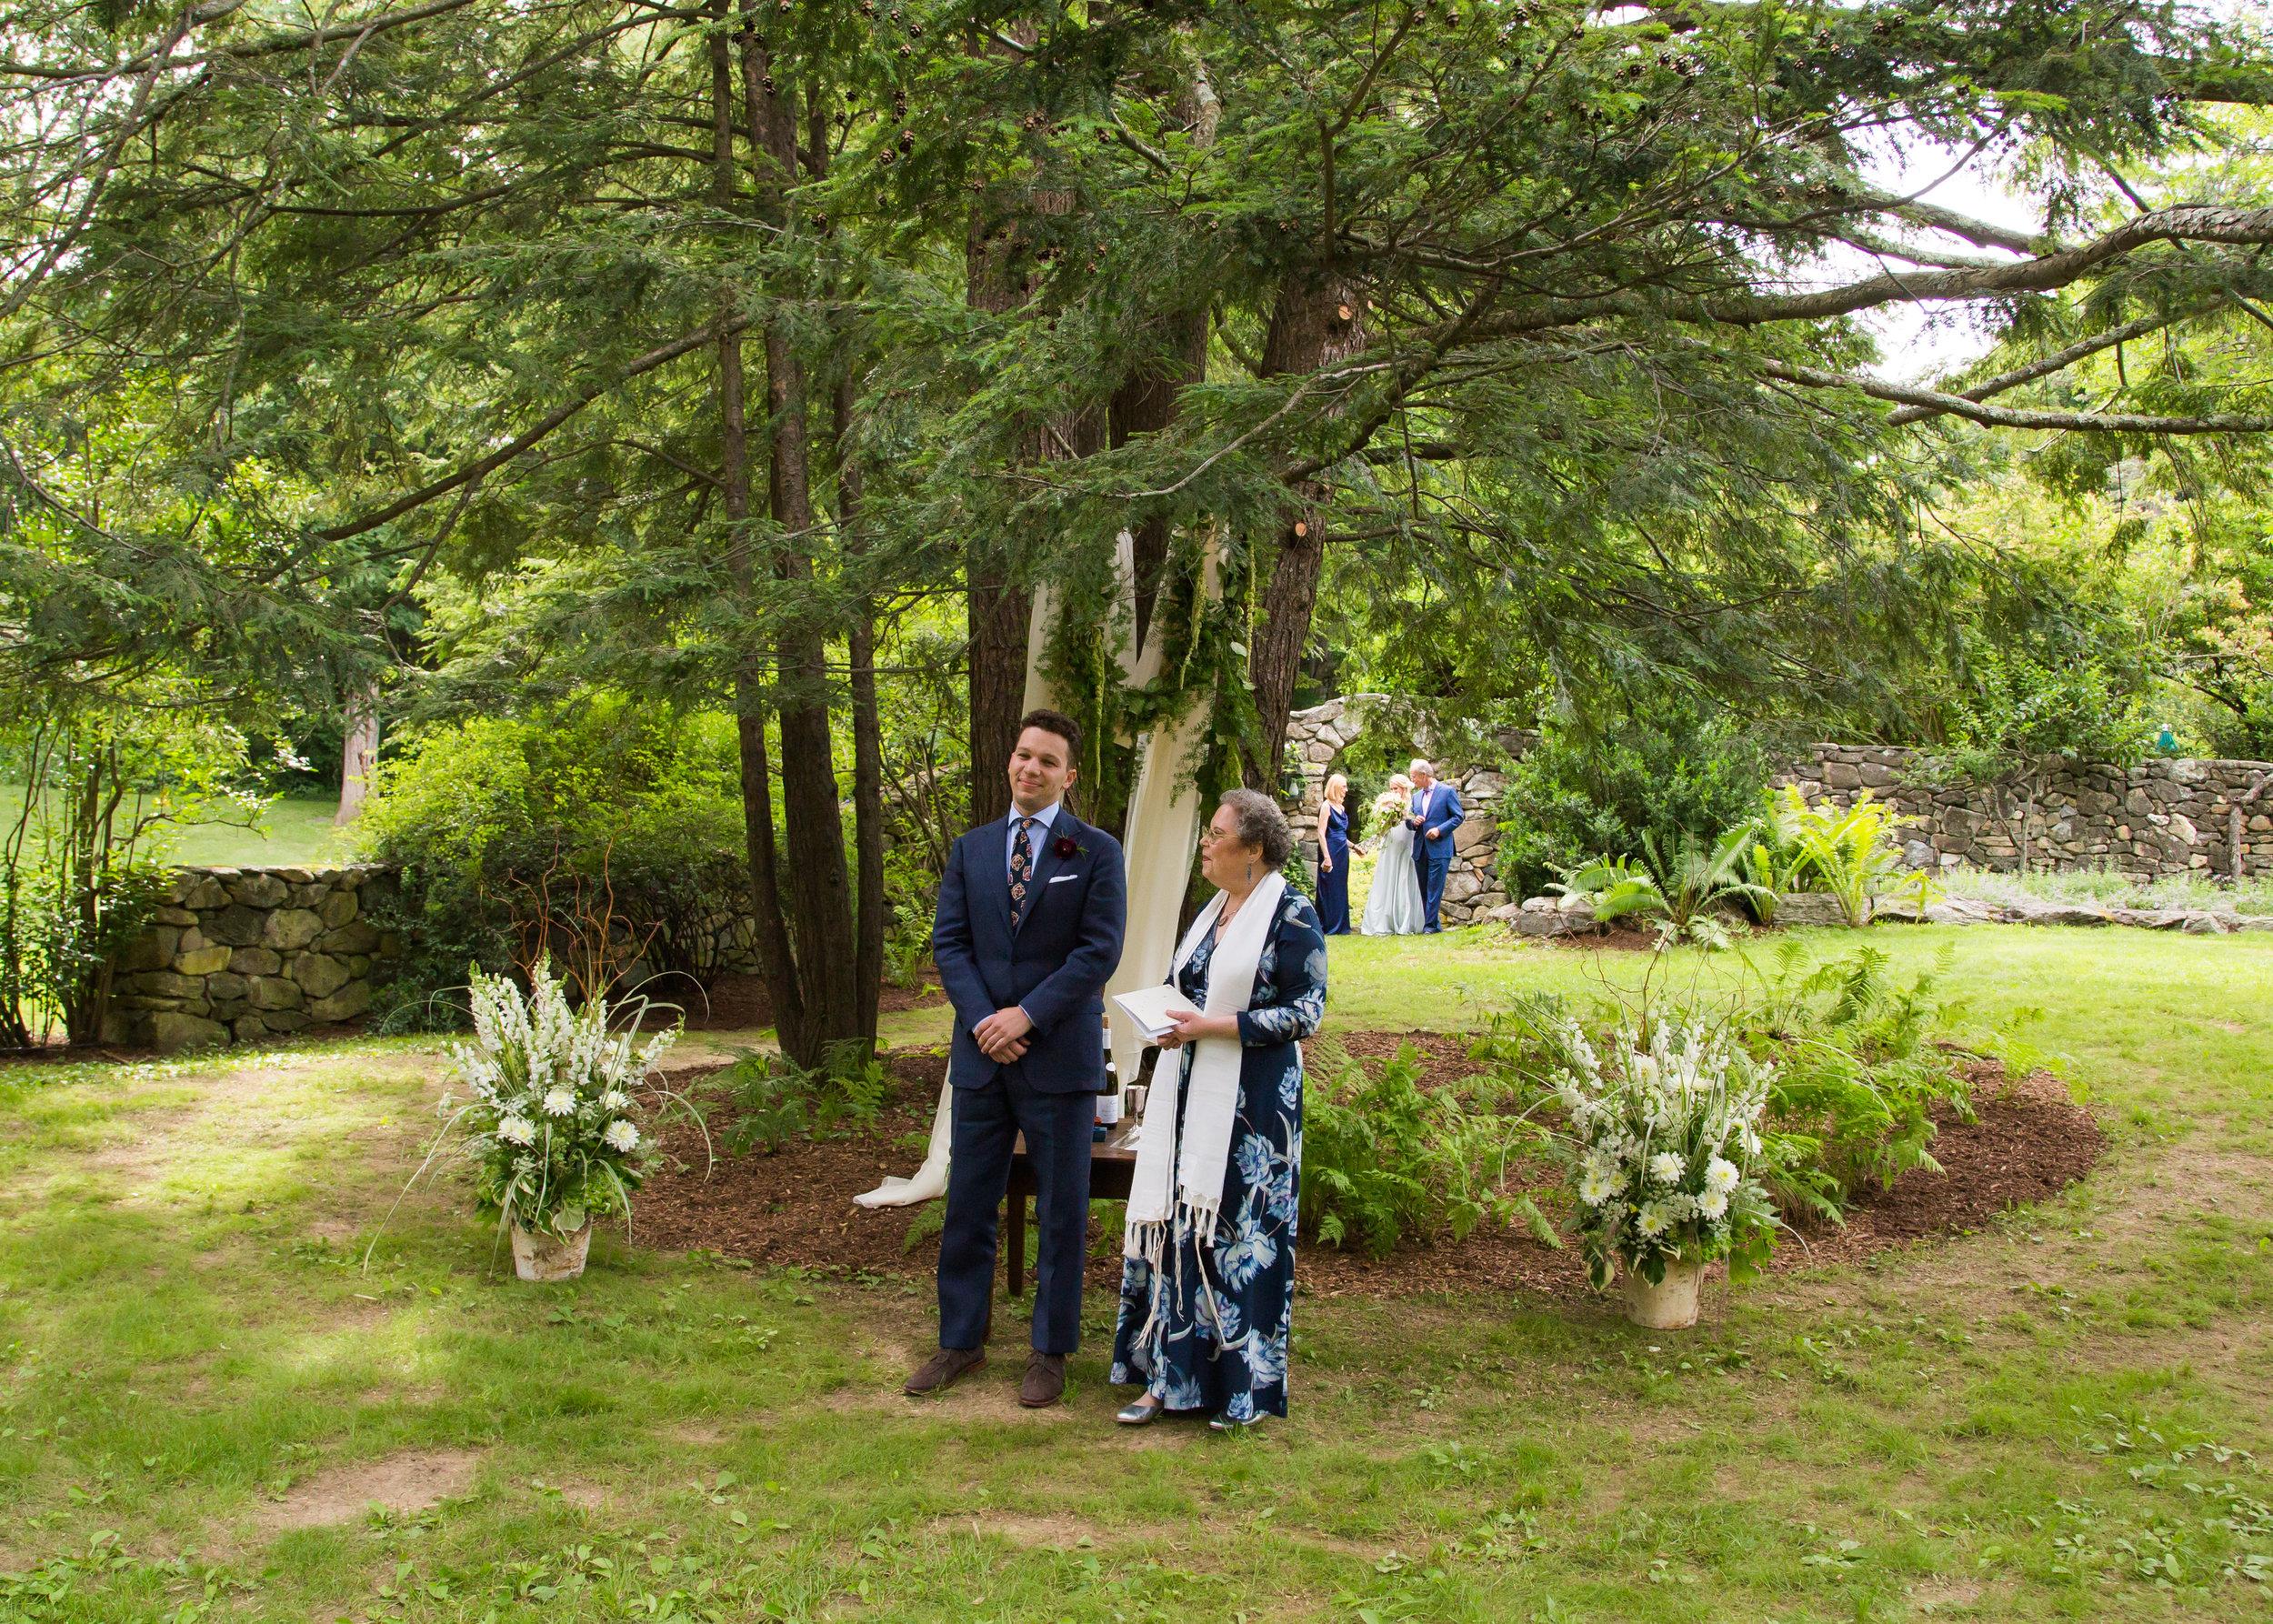 Julie-and-Peter-Wedding07212018-376.jpg